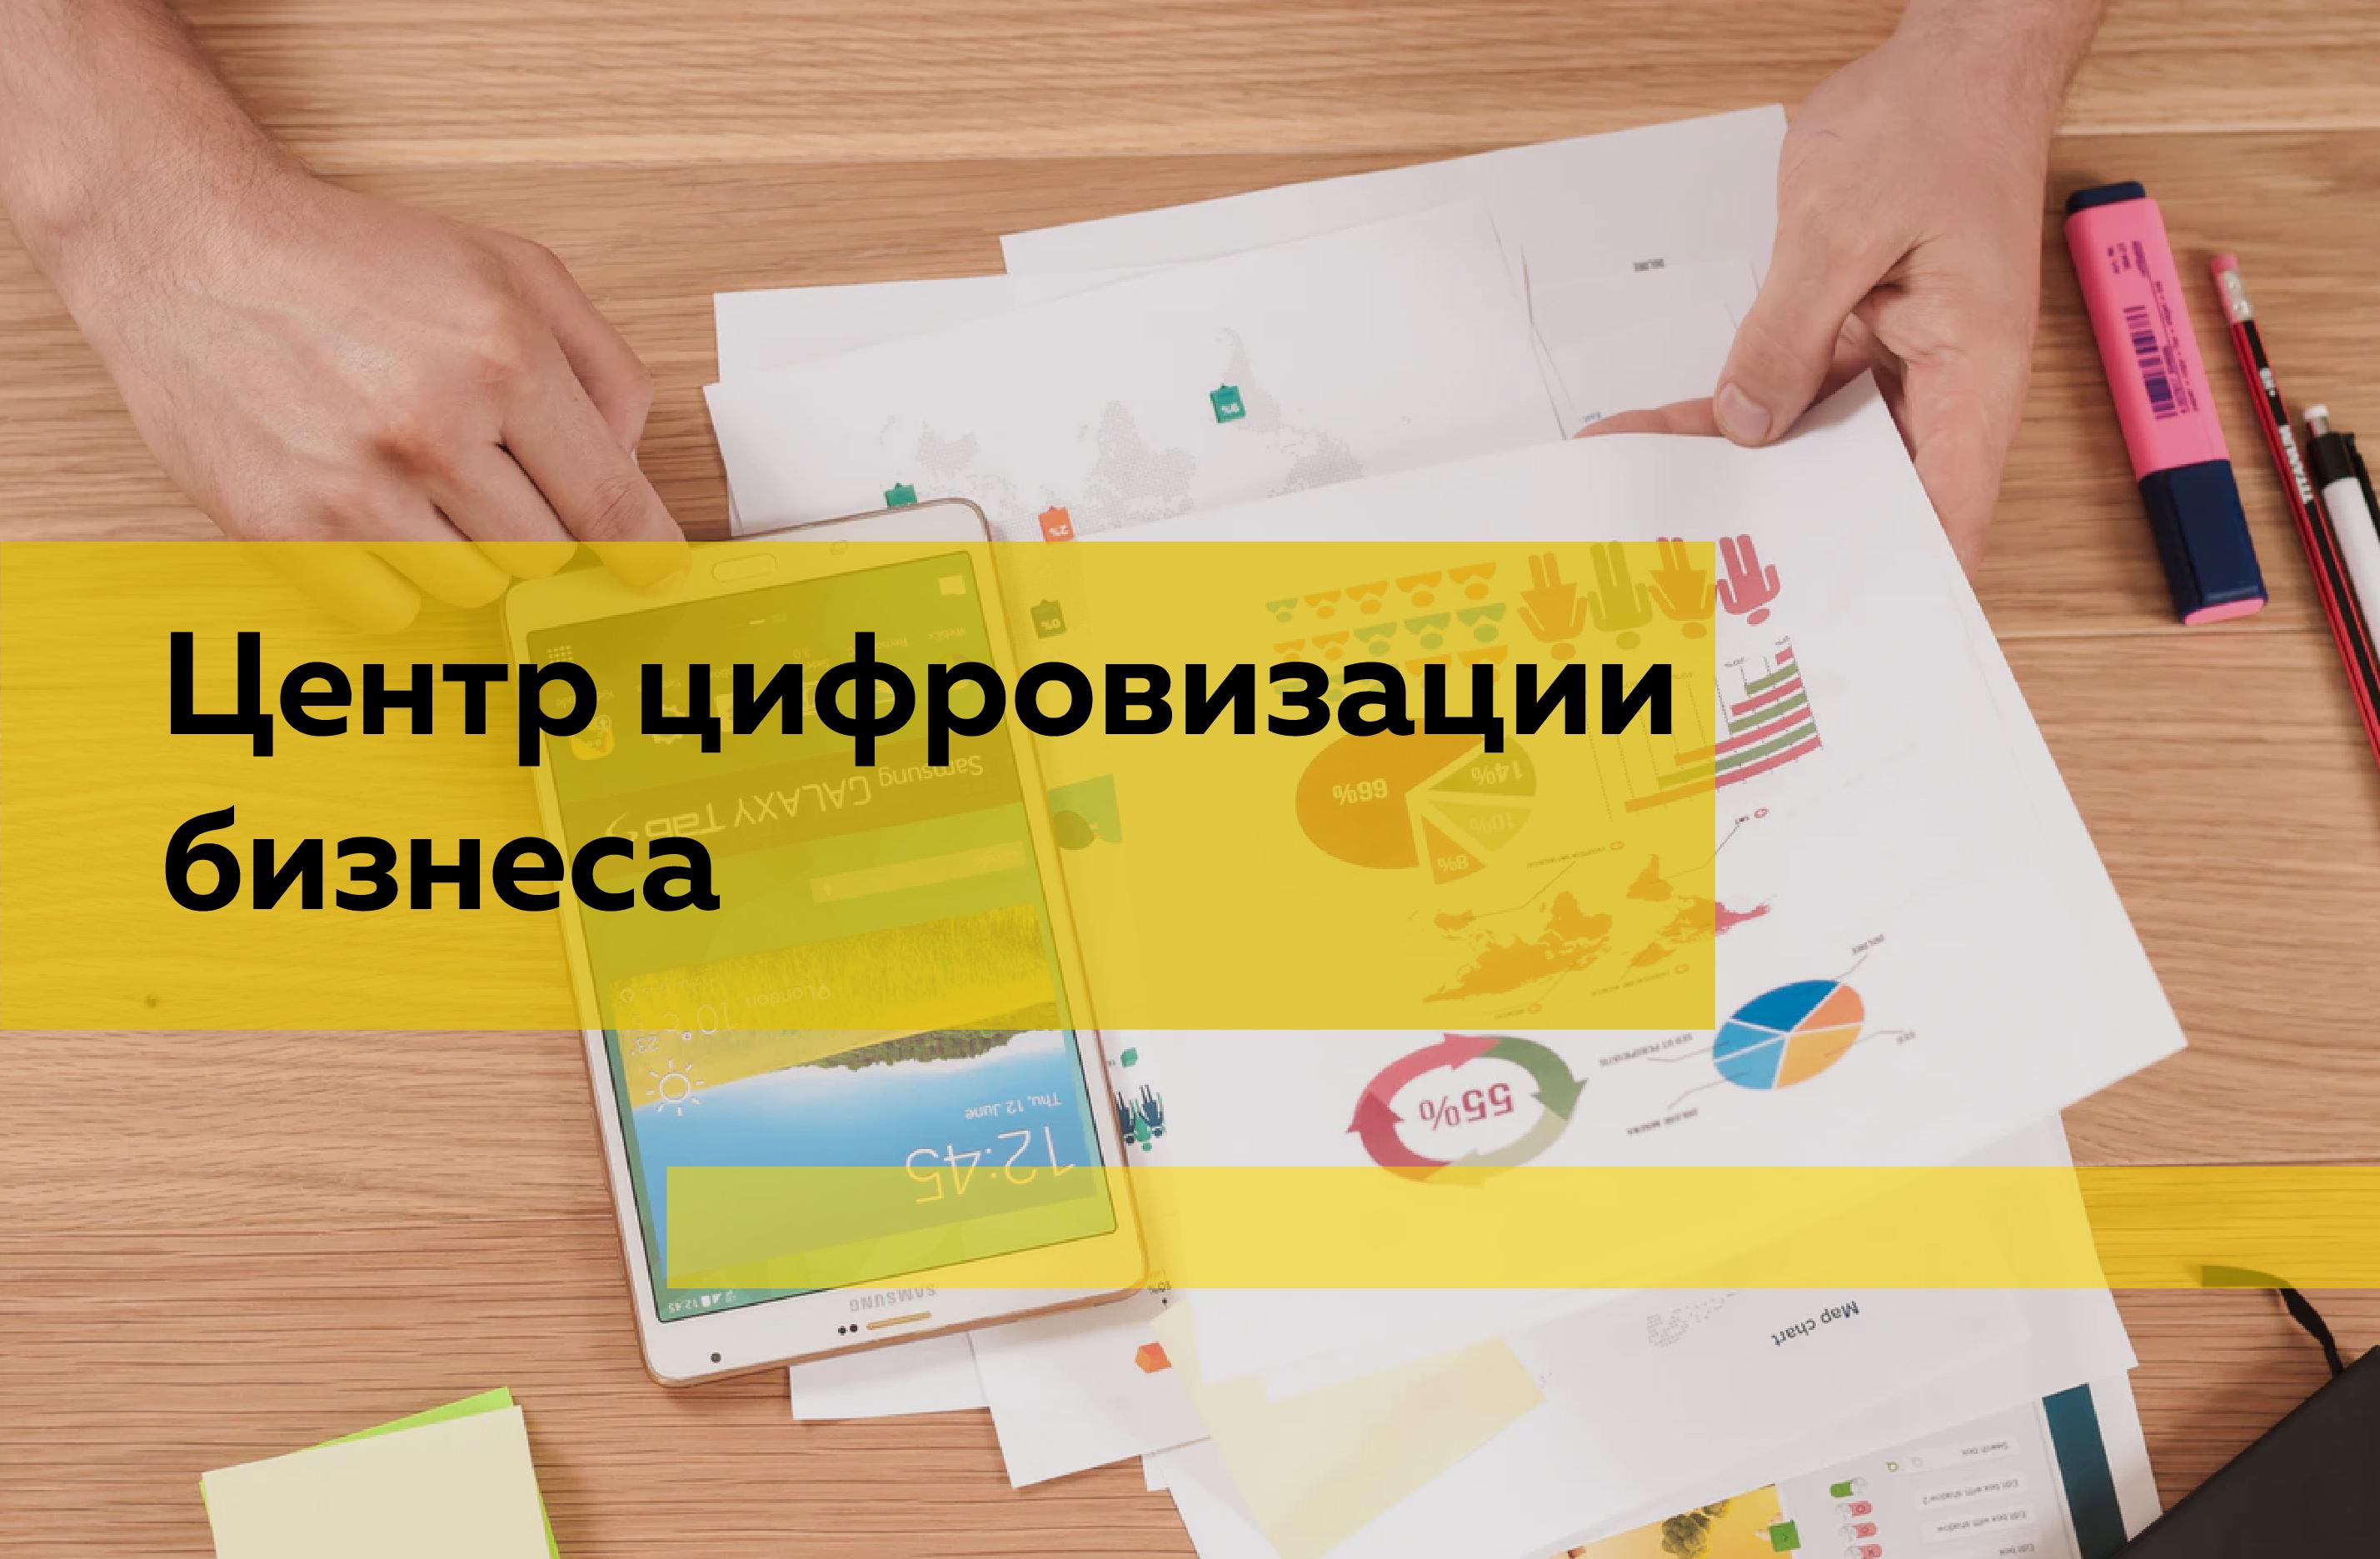 Цифровизация бизнеса: перевод бизнеса в Интернет-пространство